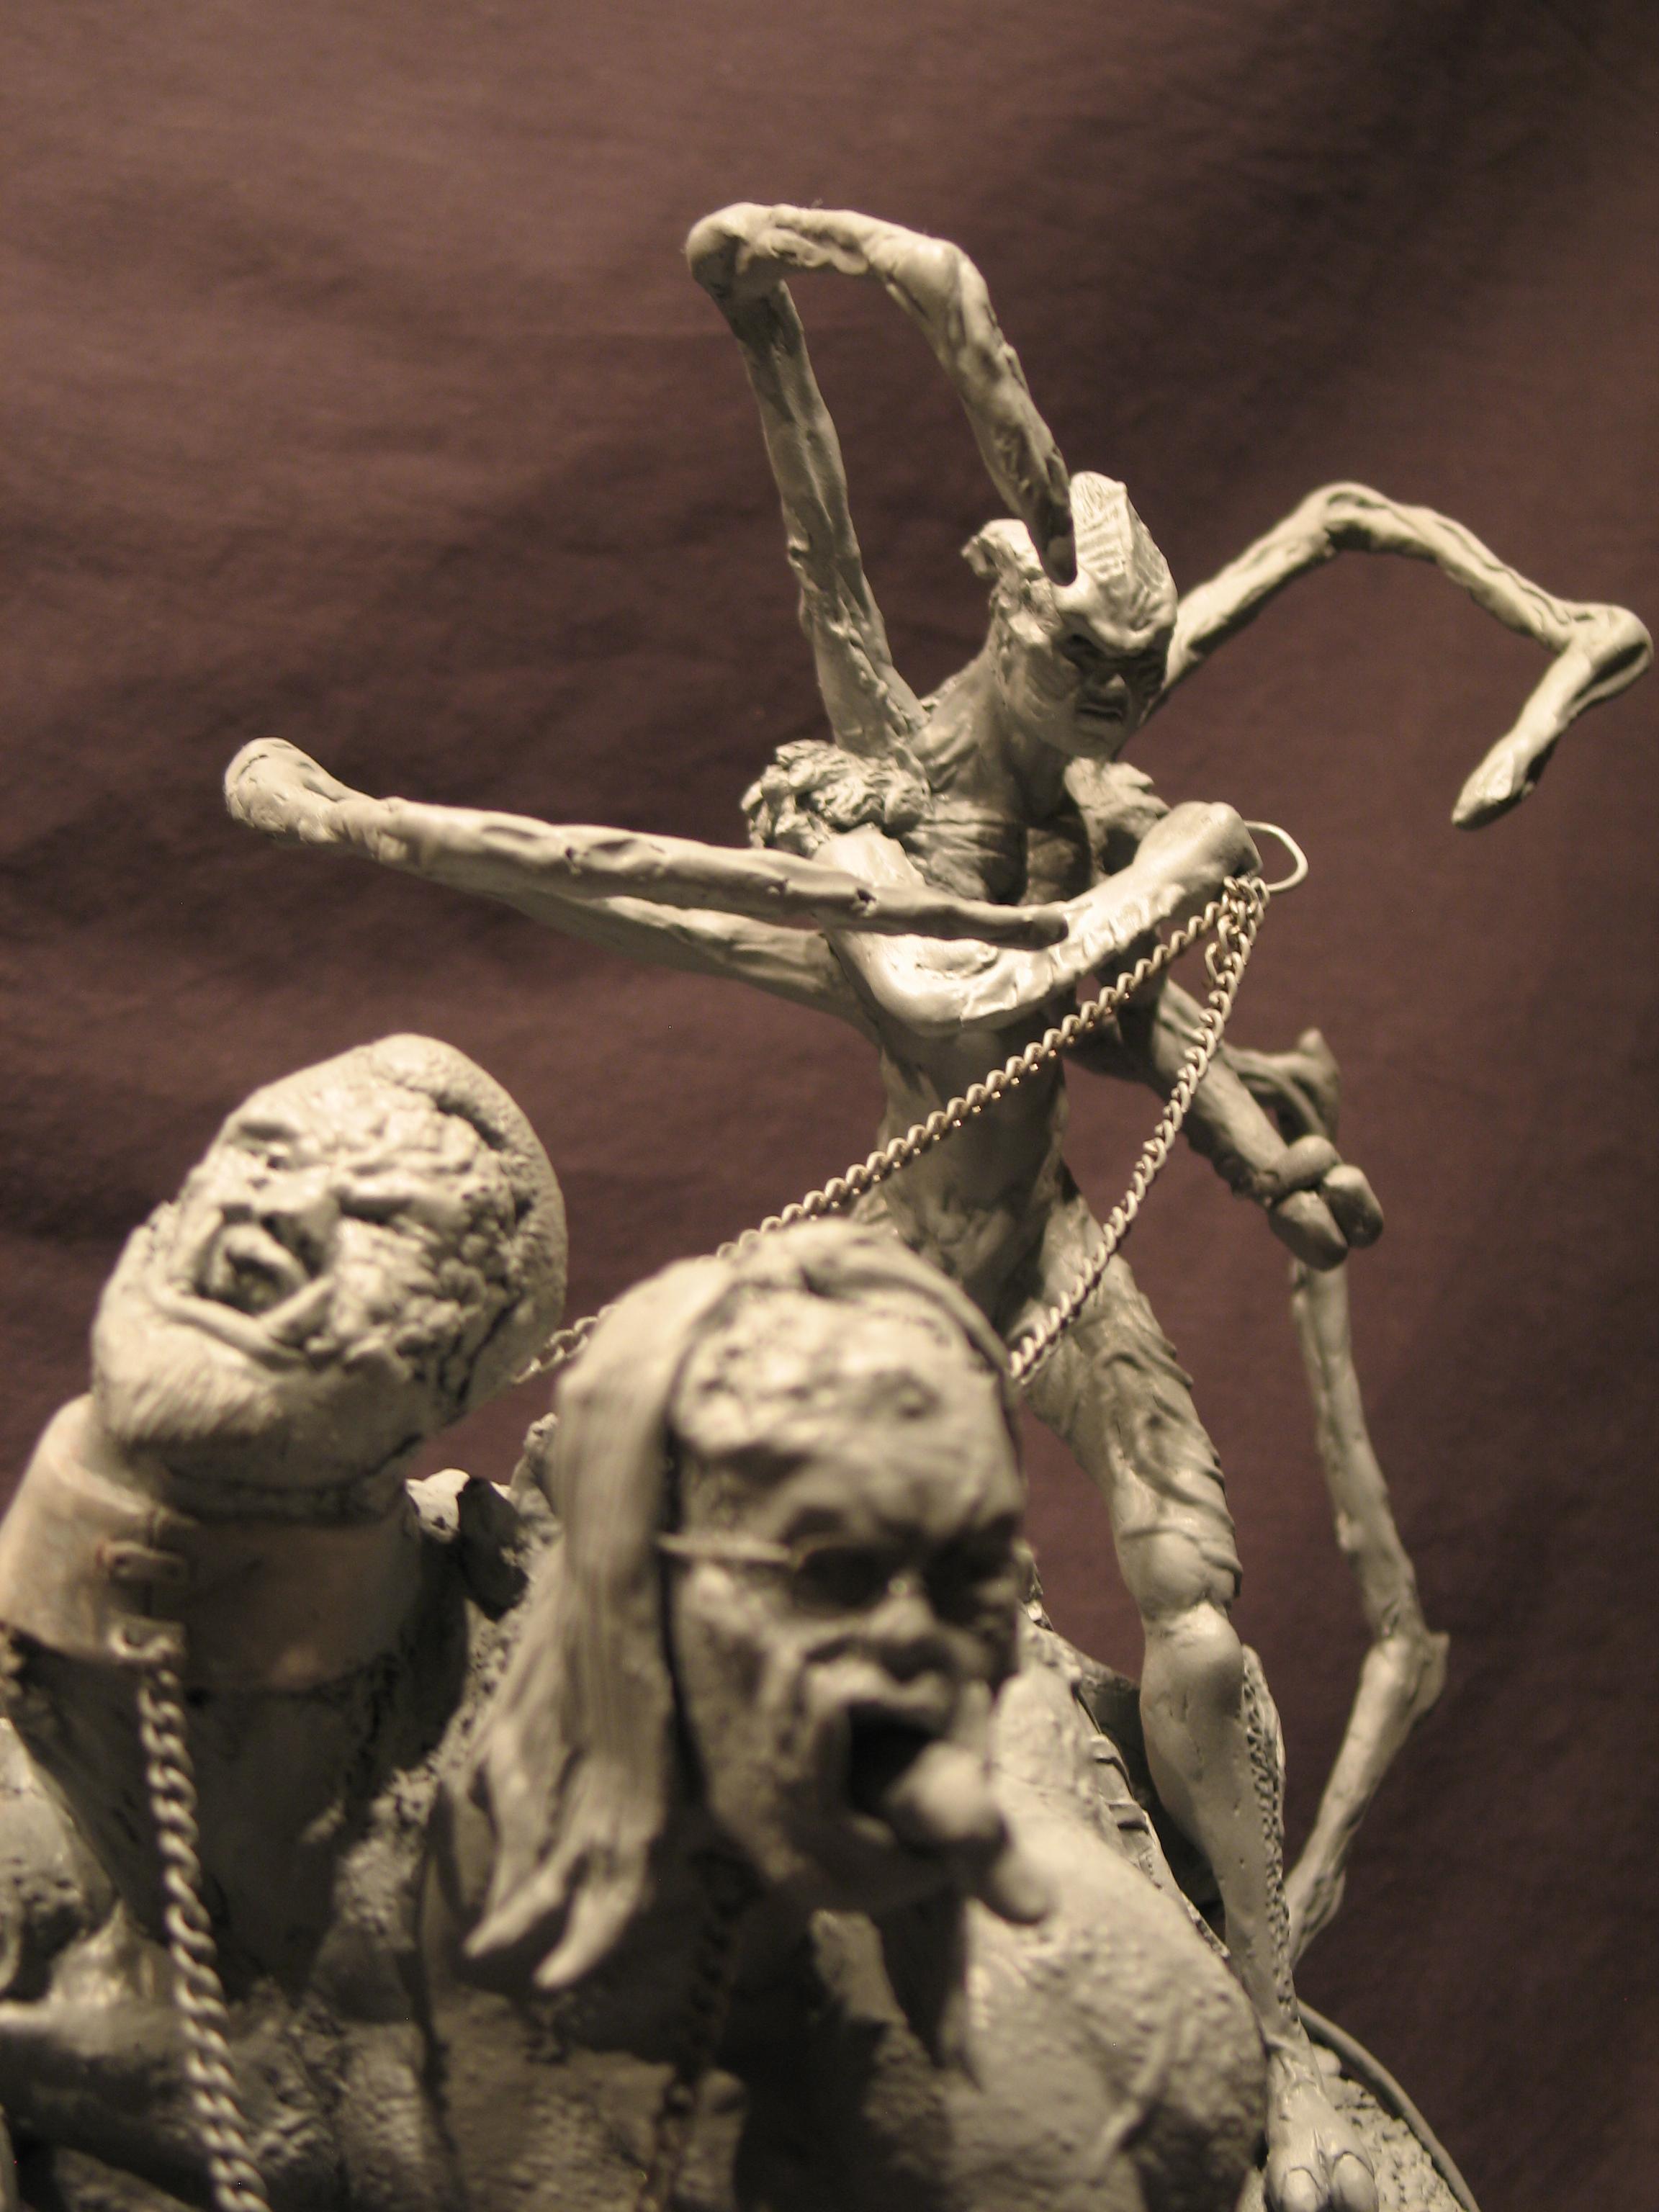 Spiderzero Riding the Shiflett Monster (Concours Shiflett 2) S173